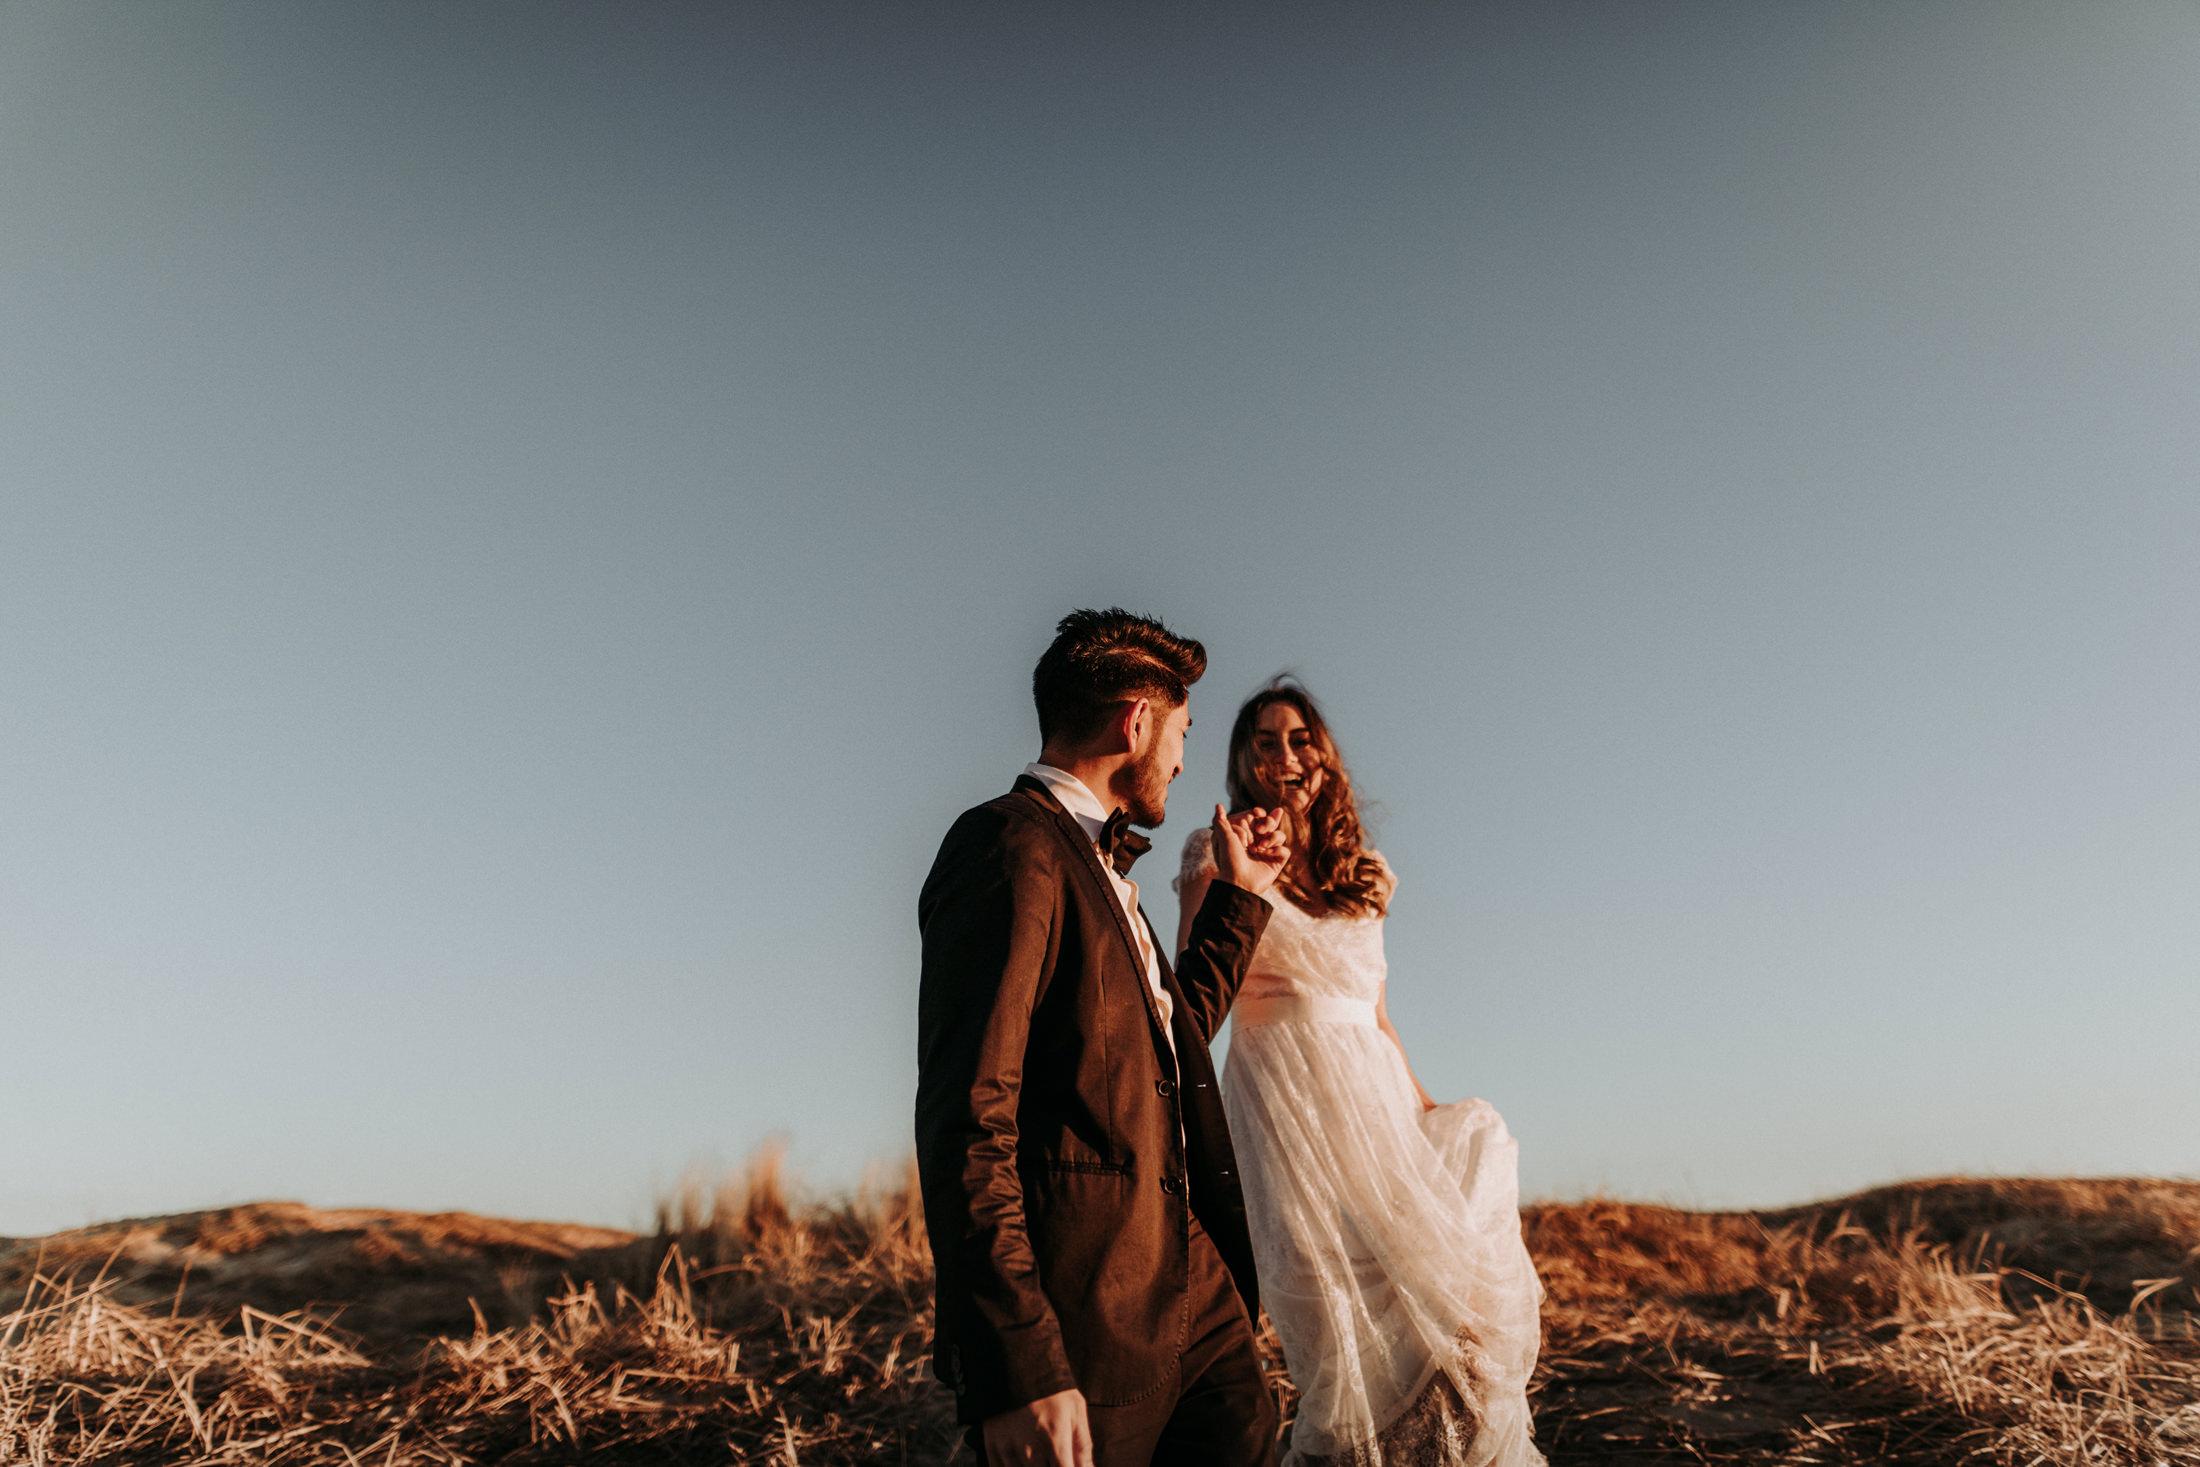 Wedding_Photographer_Mallorca_Daniela-Marquardt_Photography_CanaryIslands_Lanzarote_Iceland_Tuskany_Santorini_Portugal_Schweiz_Austria_Bayern_Elopement_Hochzeitsfotograf_Norddeichich_52